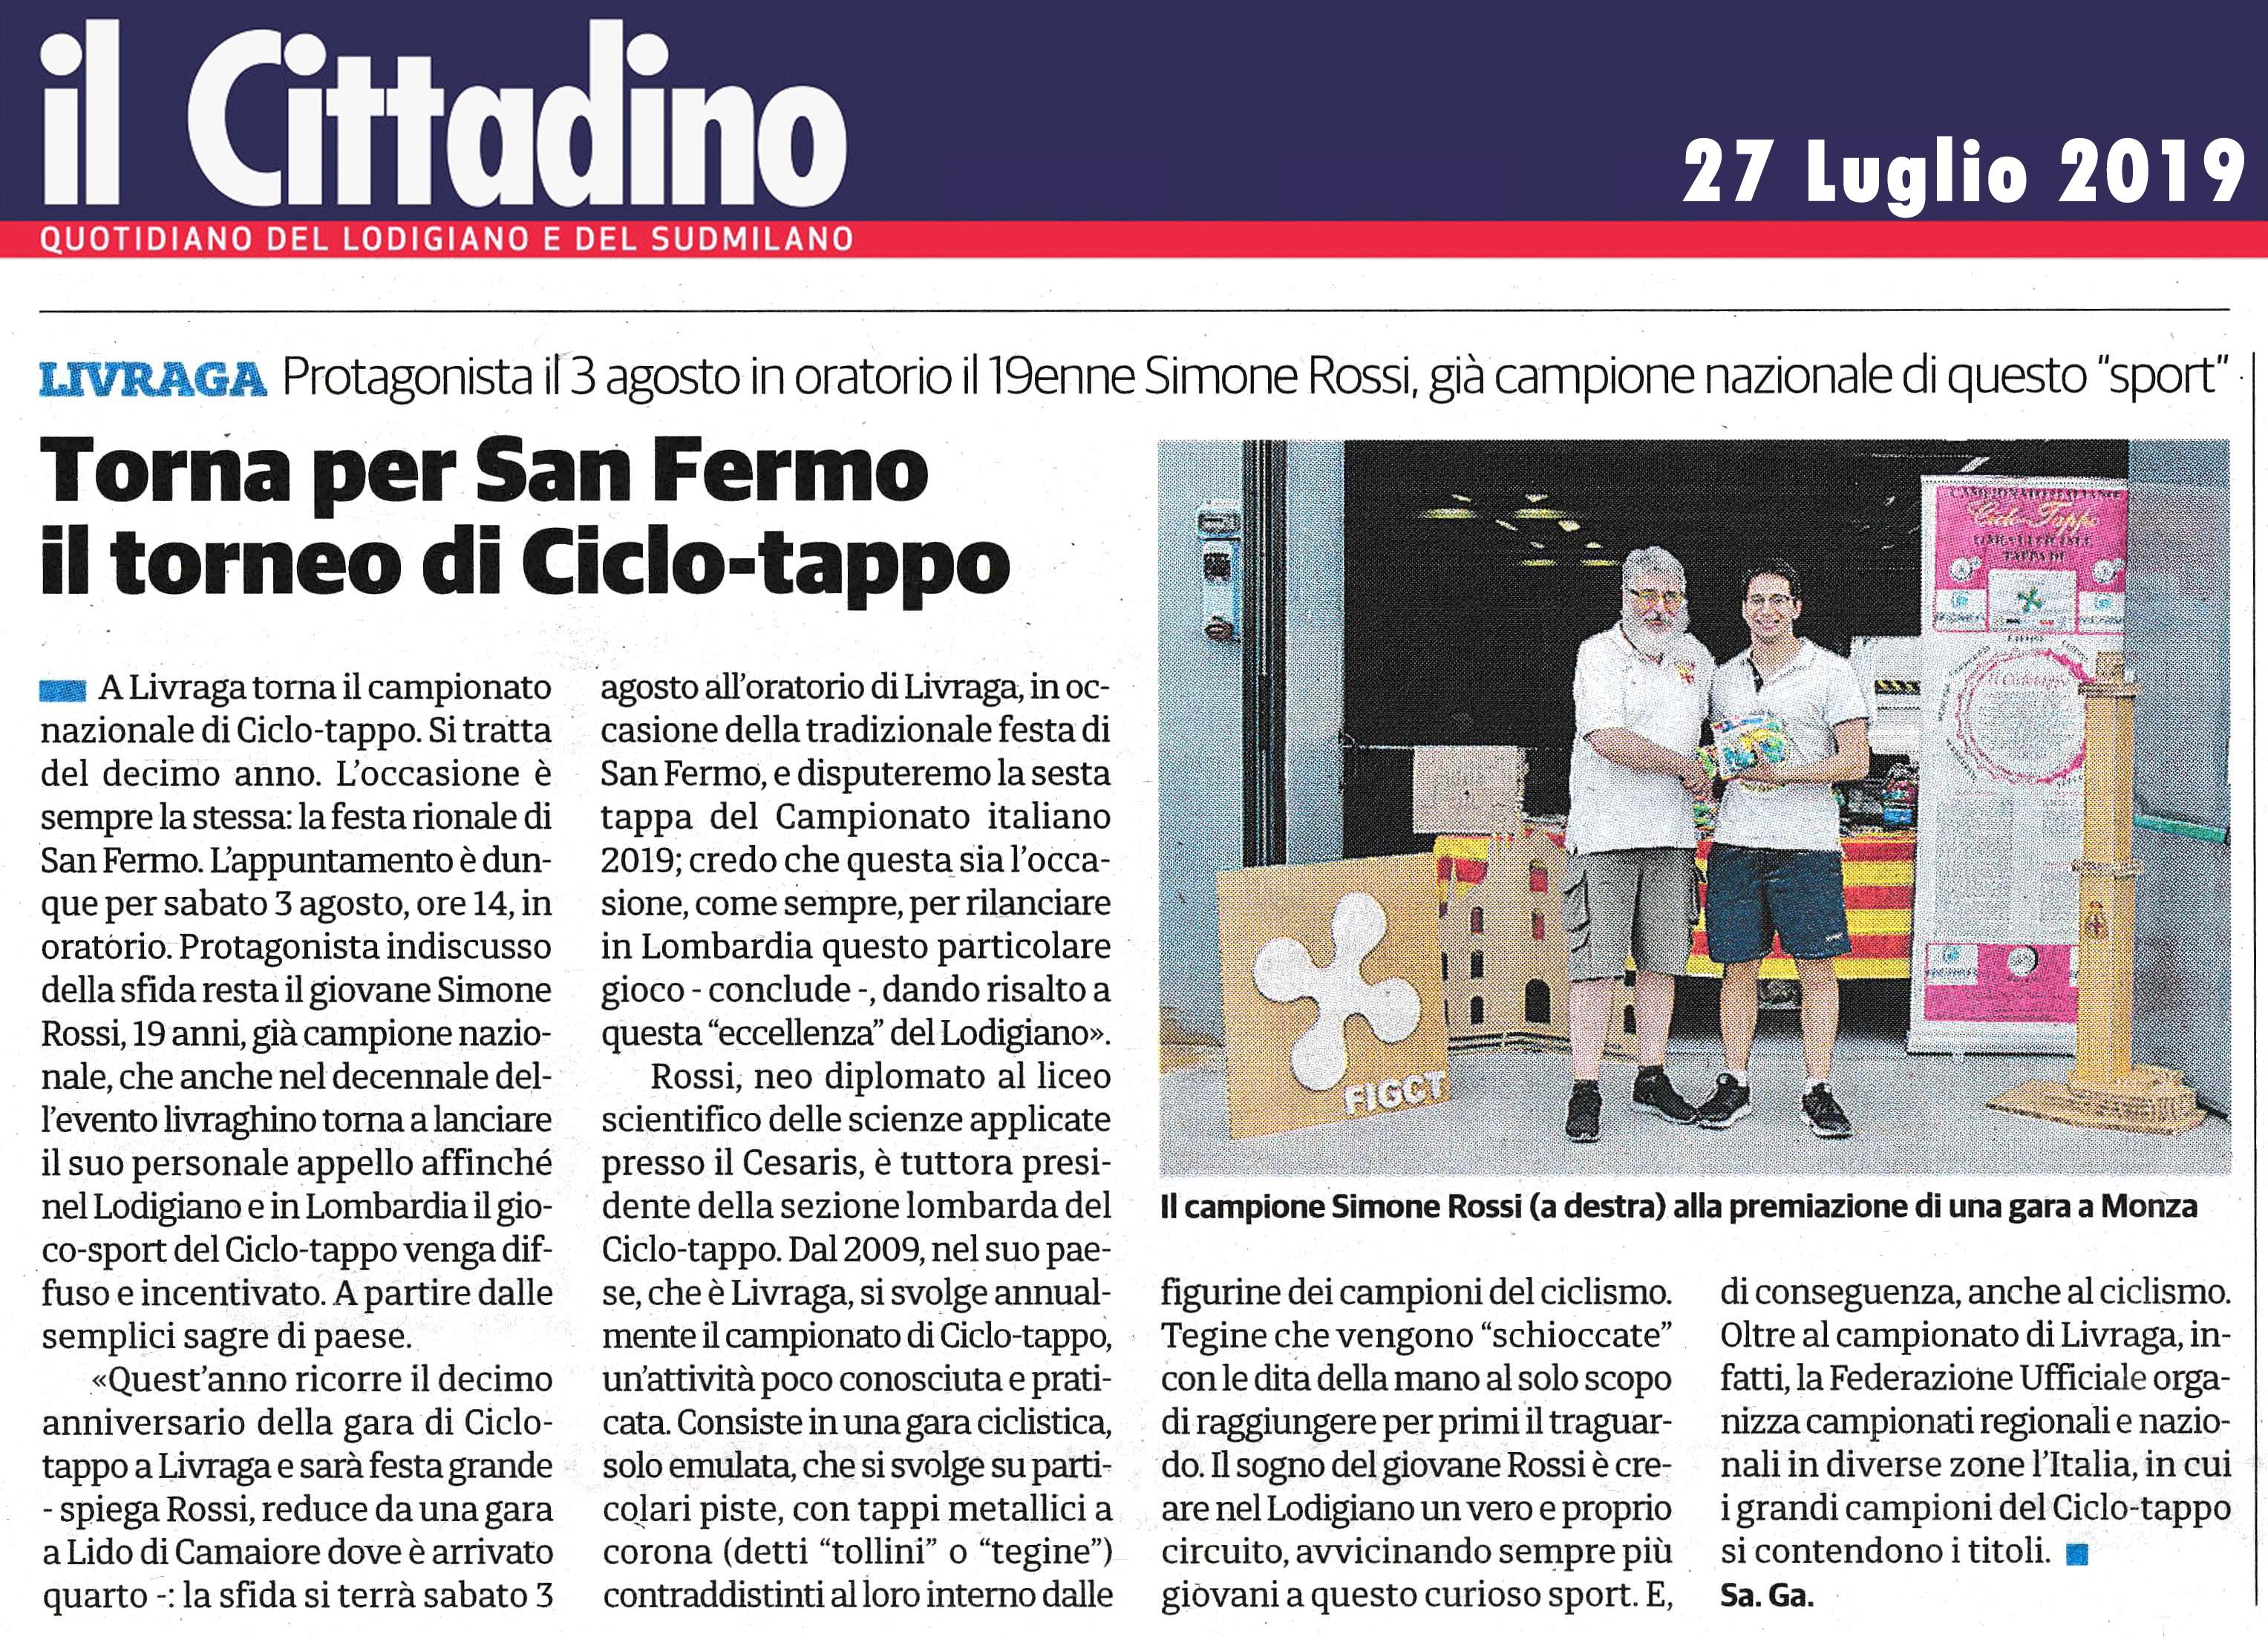 2019-07-27_Il Cittadino